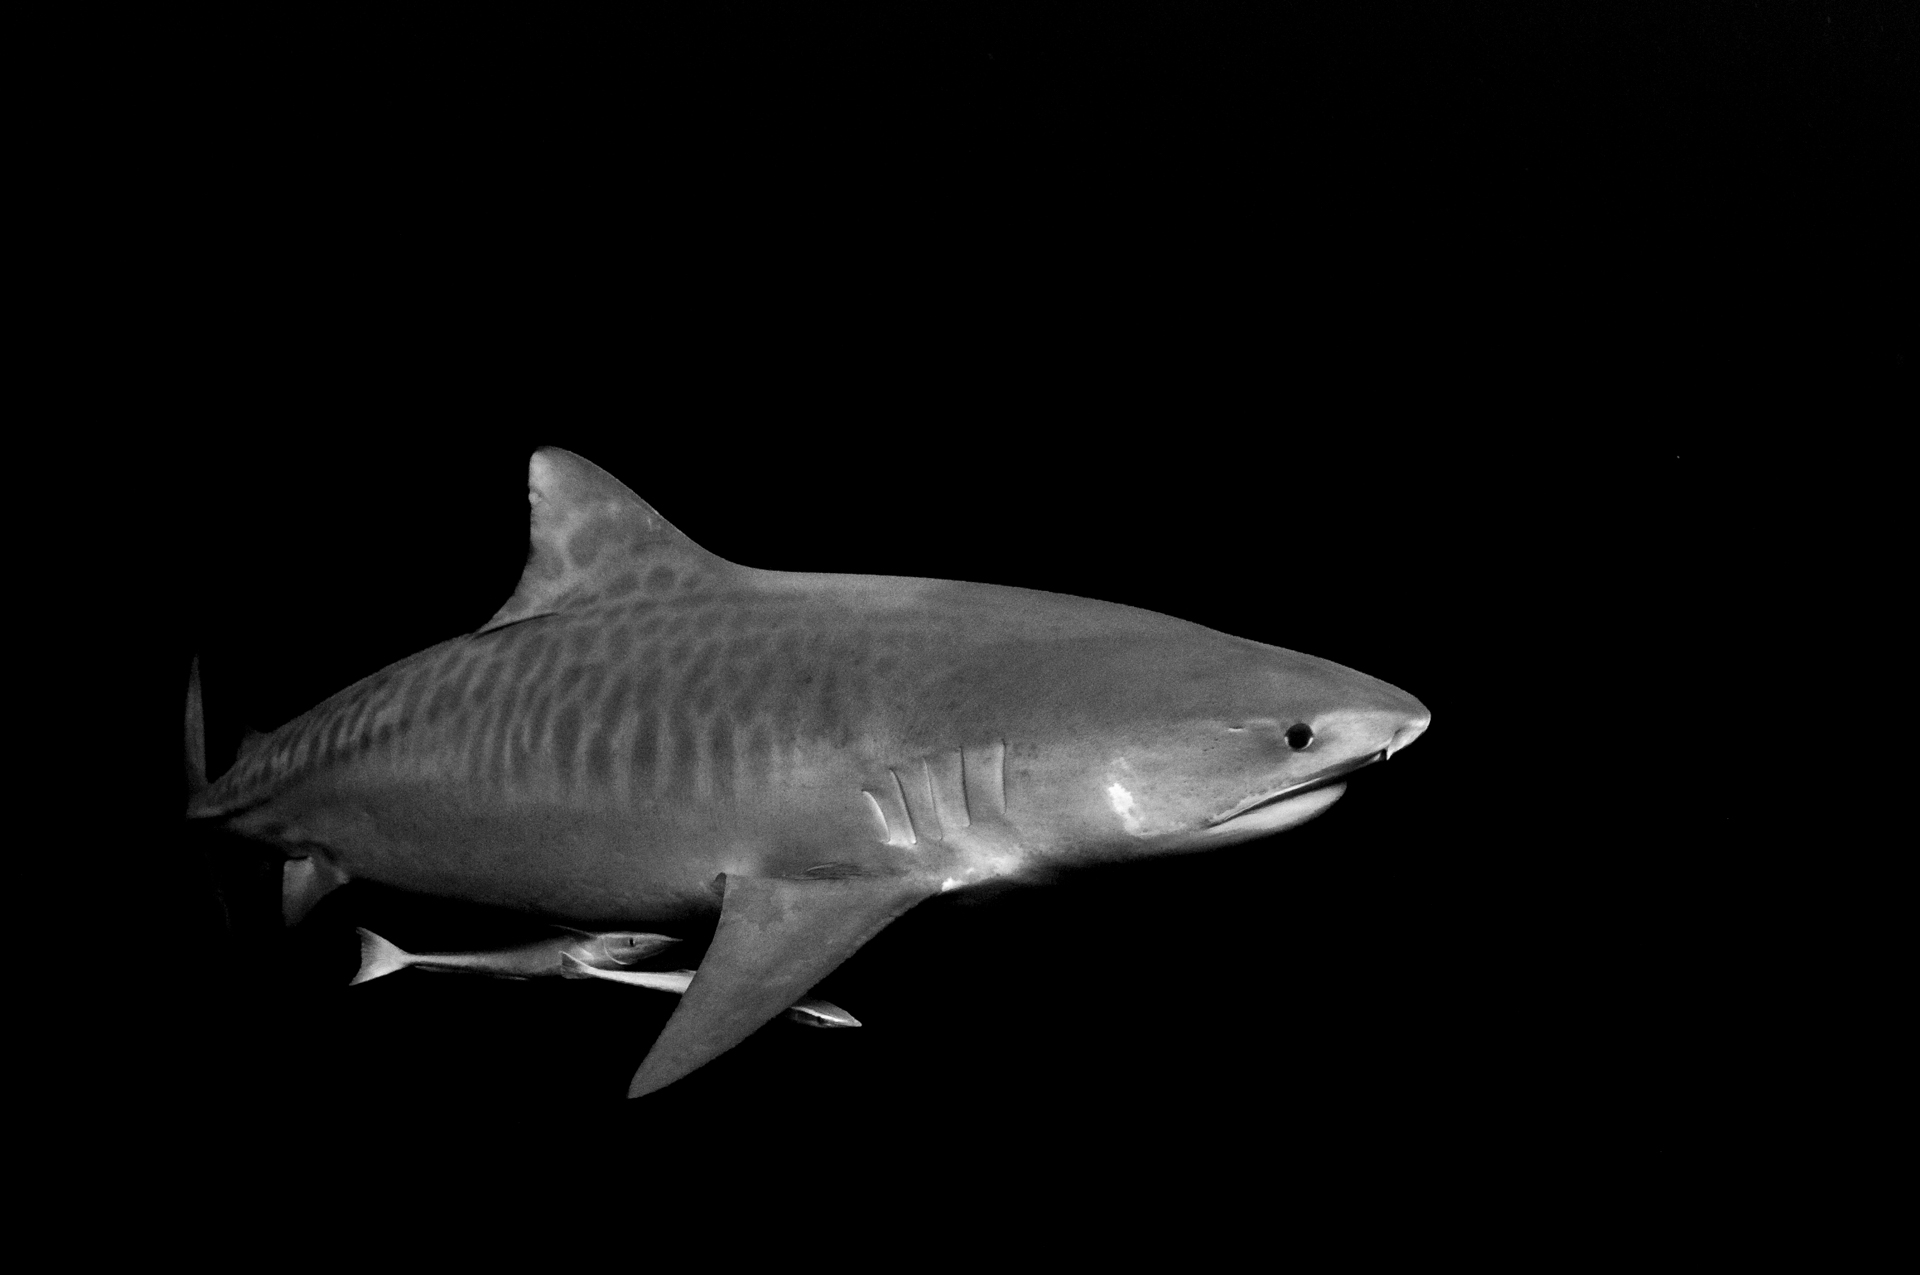 shark safari east africa swim with sharks.jpg